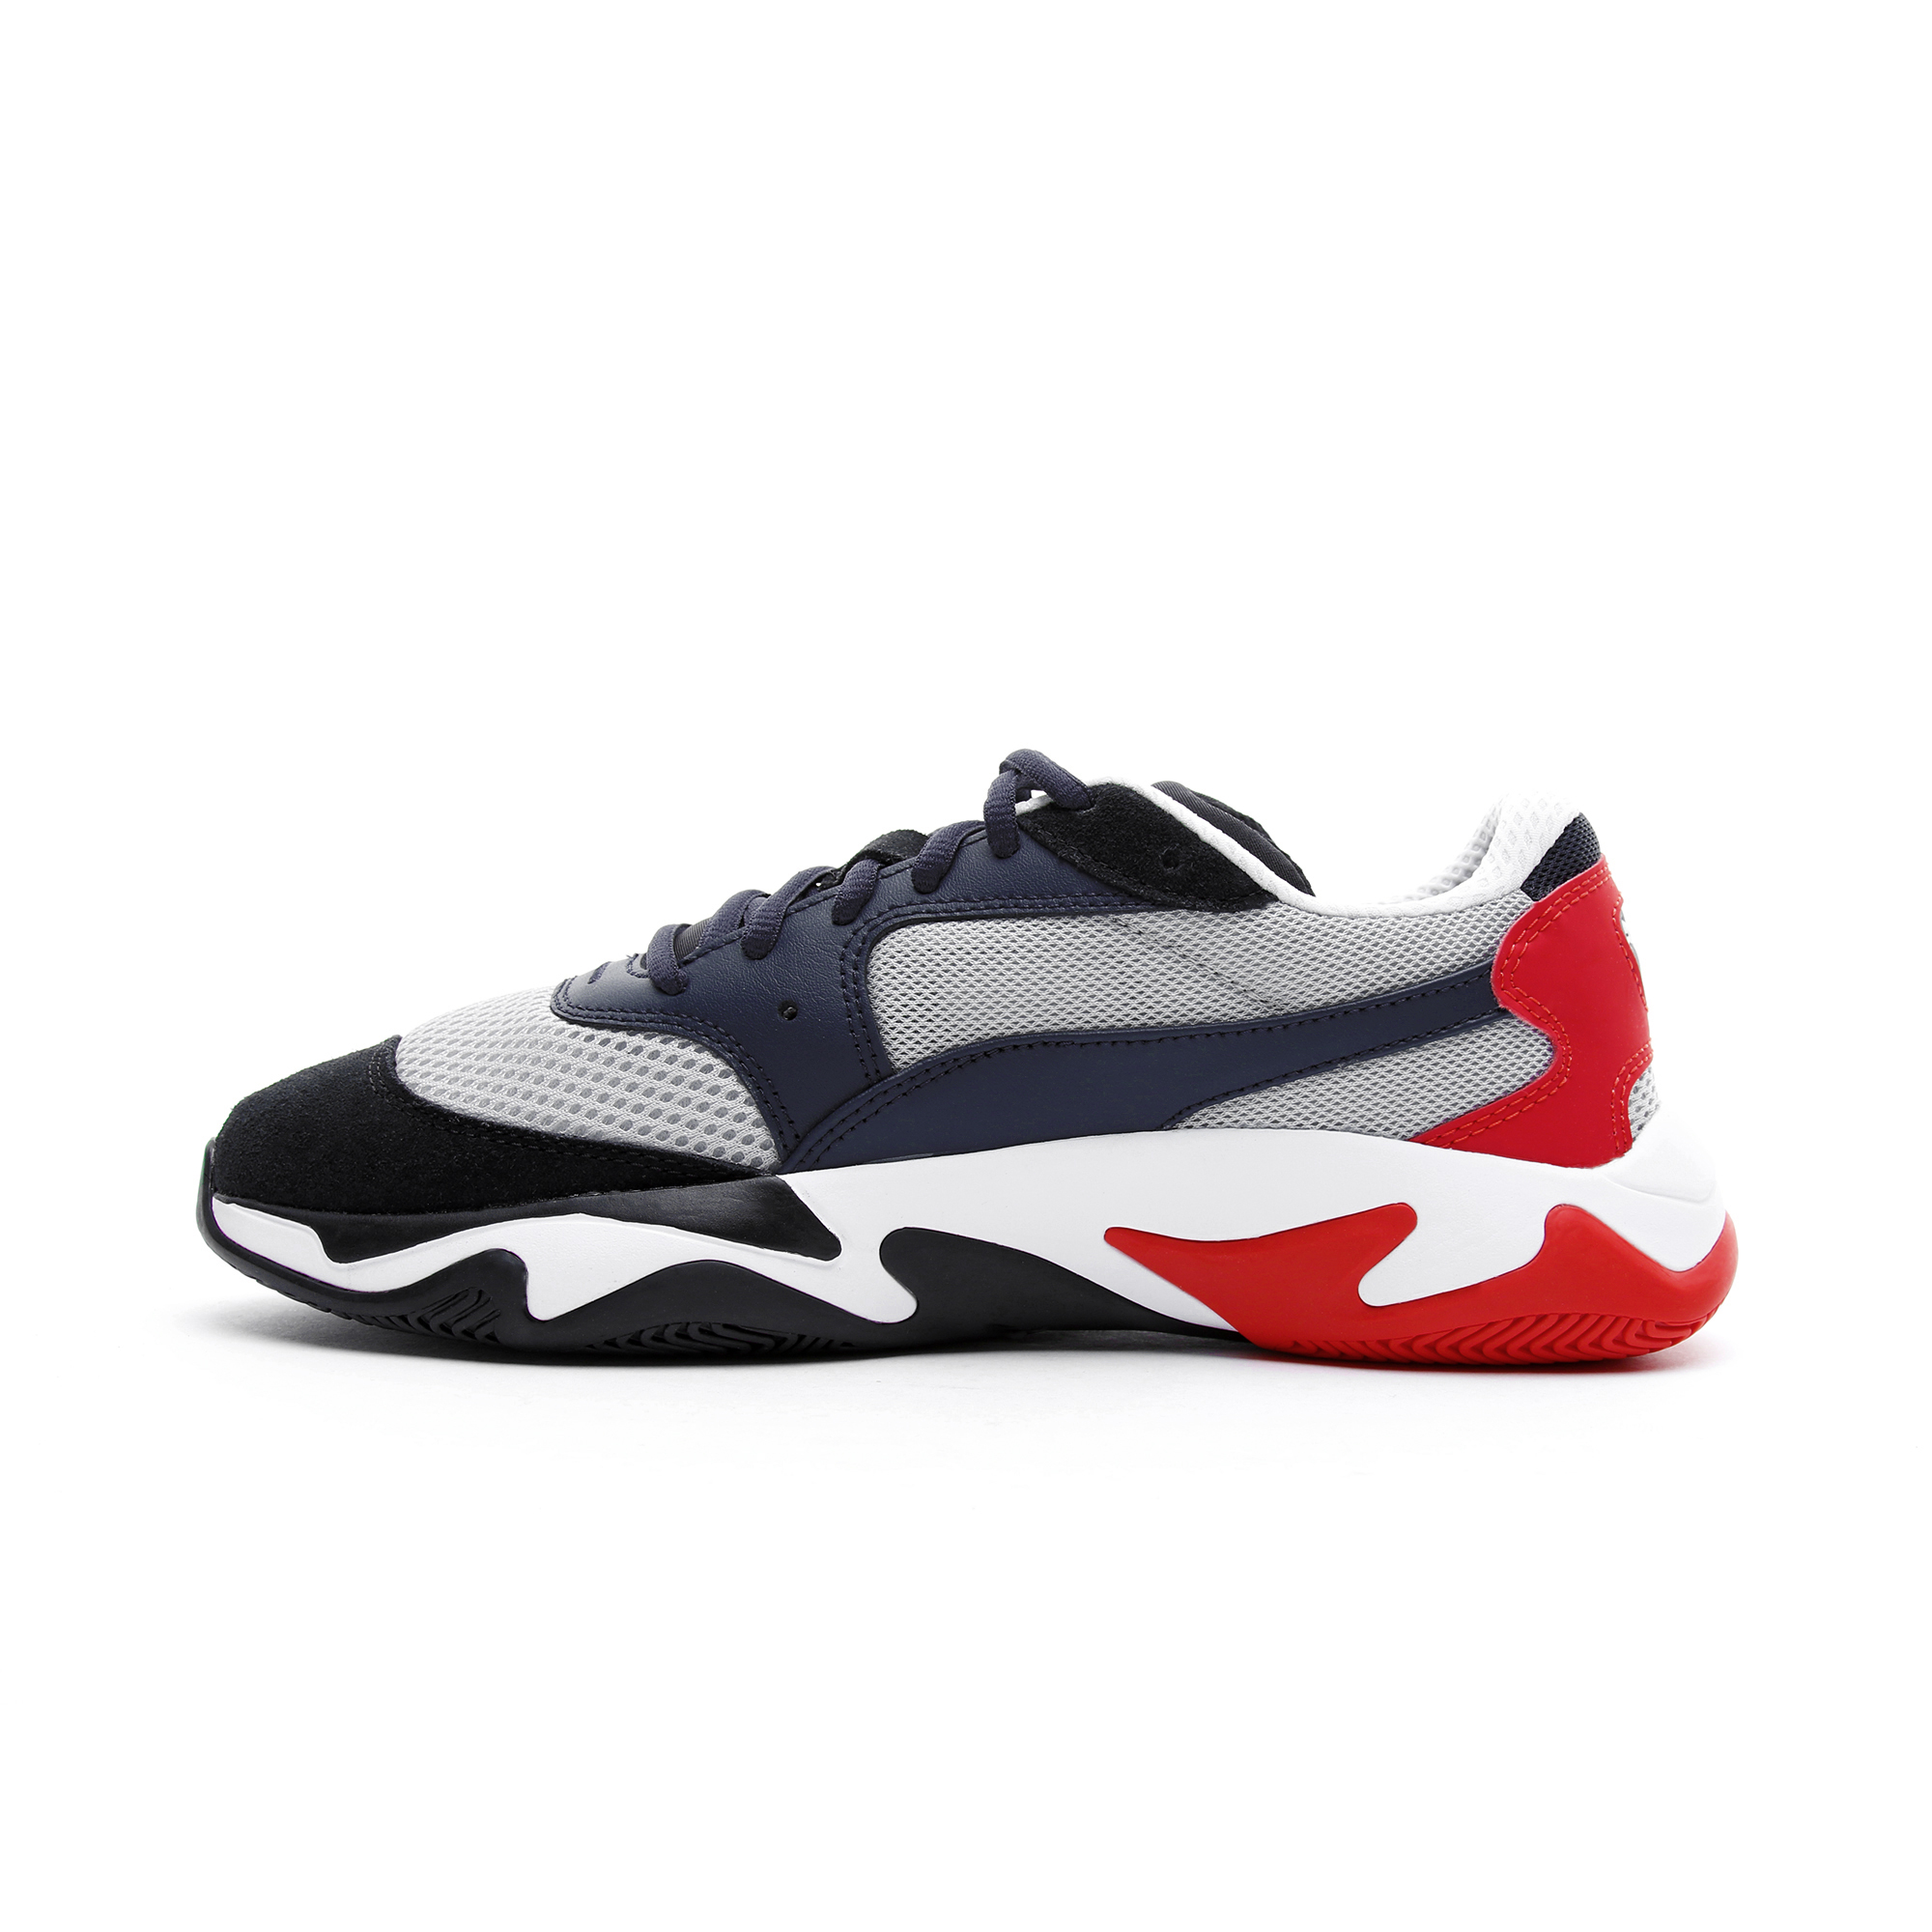 Puma Storm Origin Erkek Renkli Spor Ayakkabı